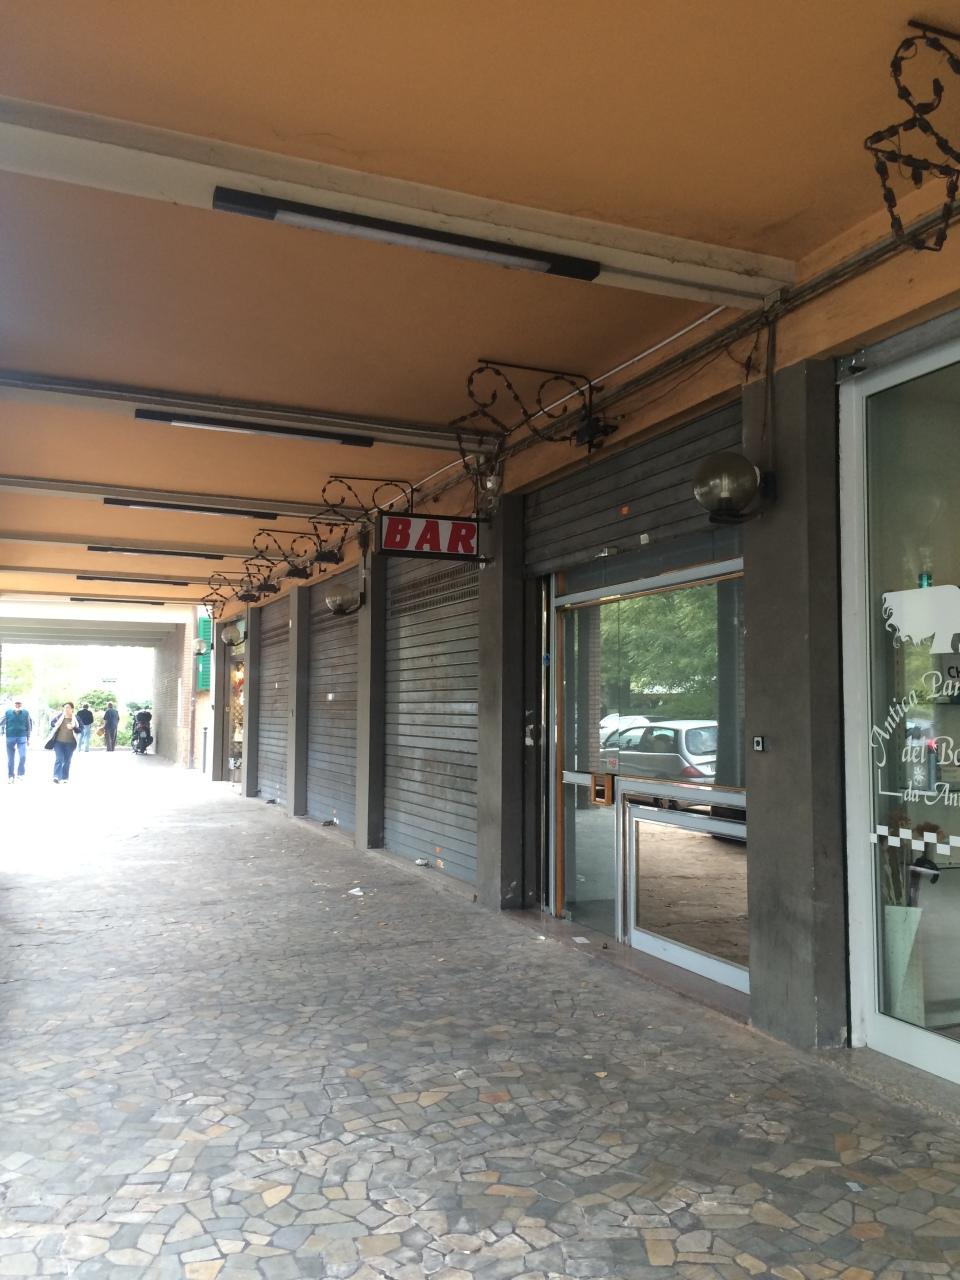 Locale commerciale Bologna